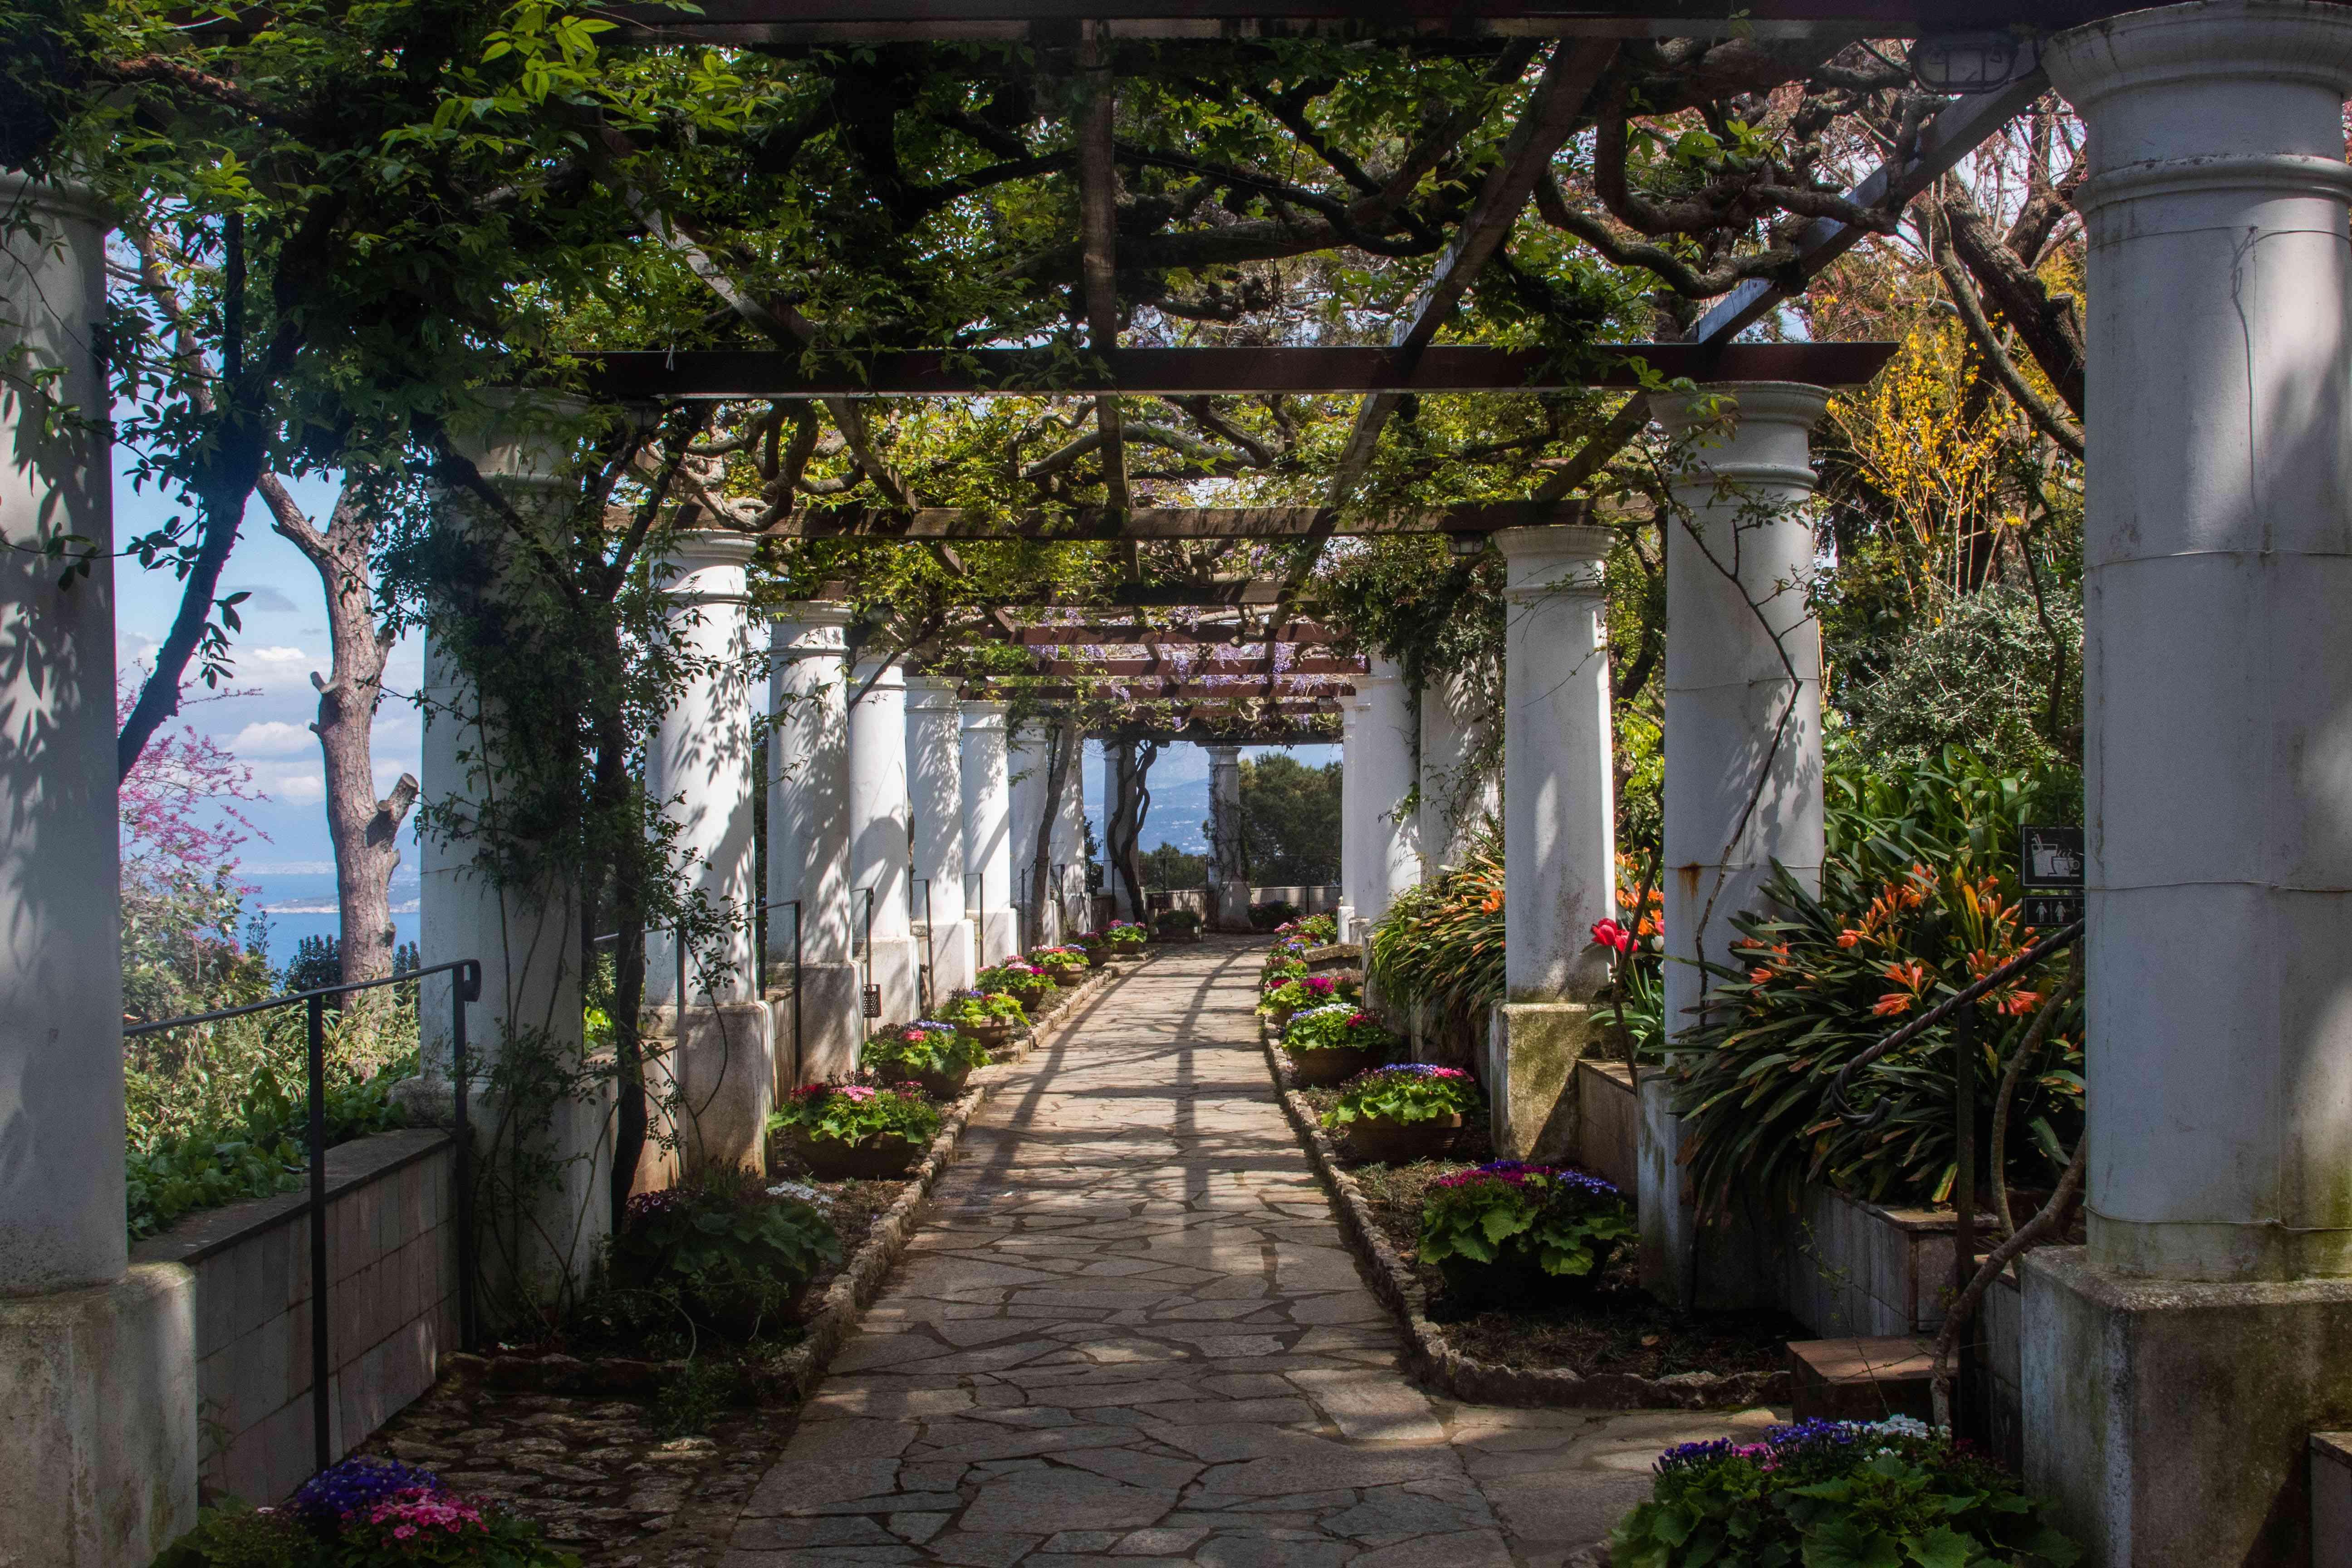 A garden walkway